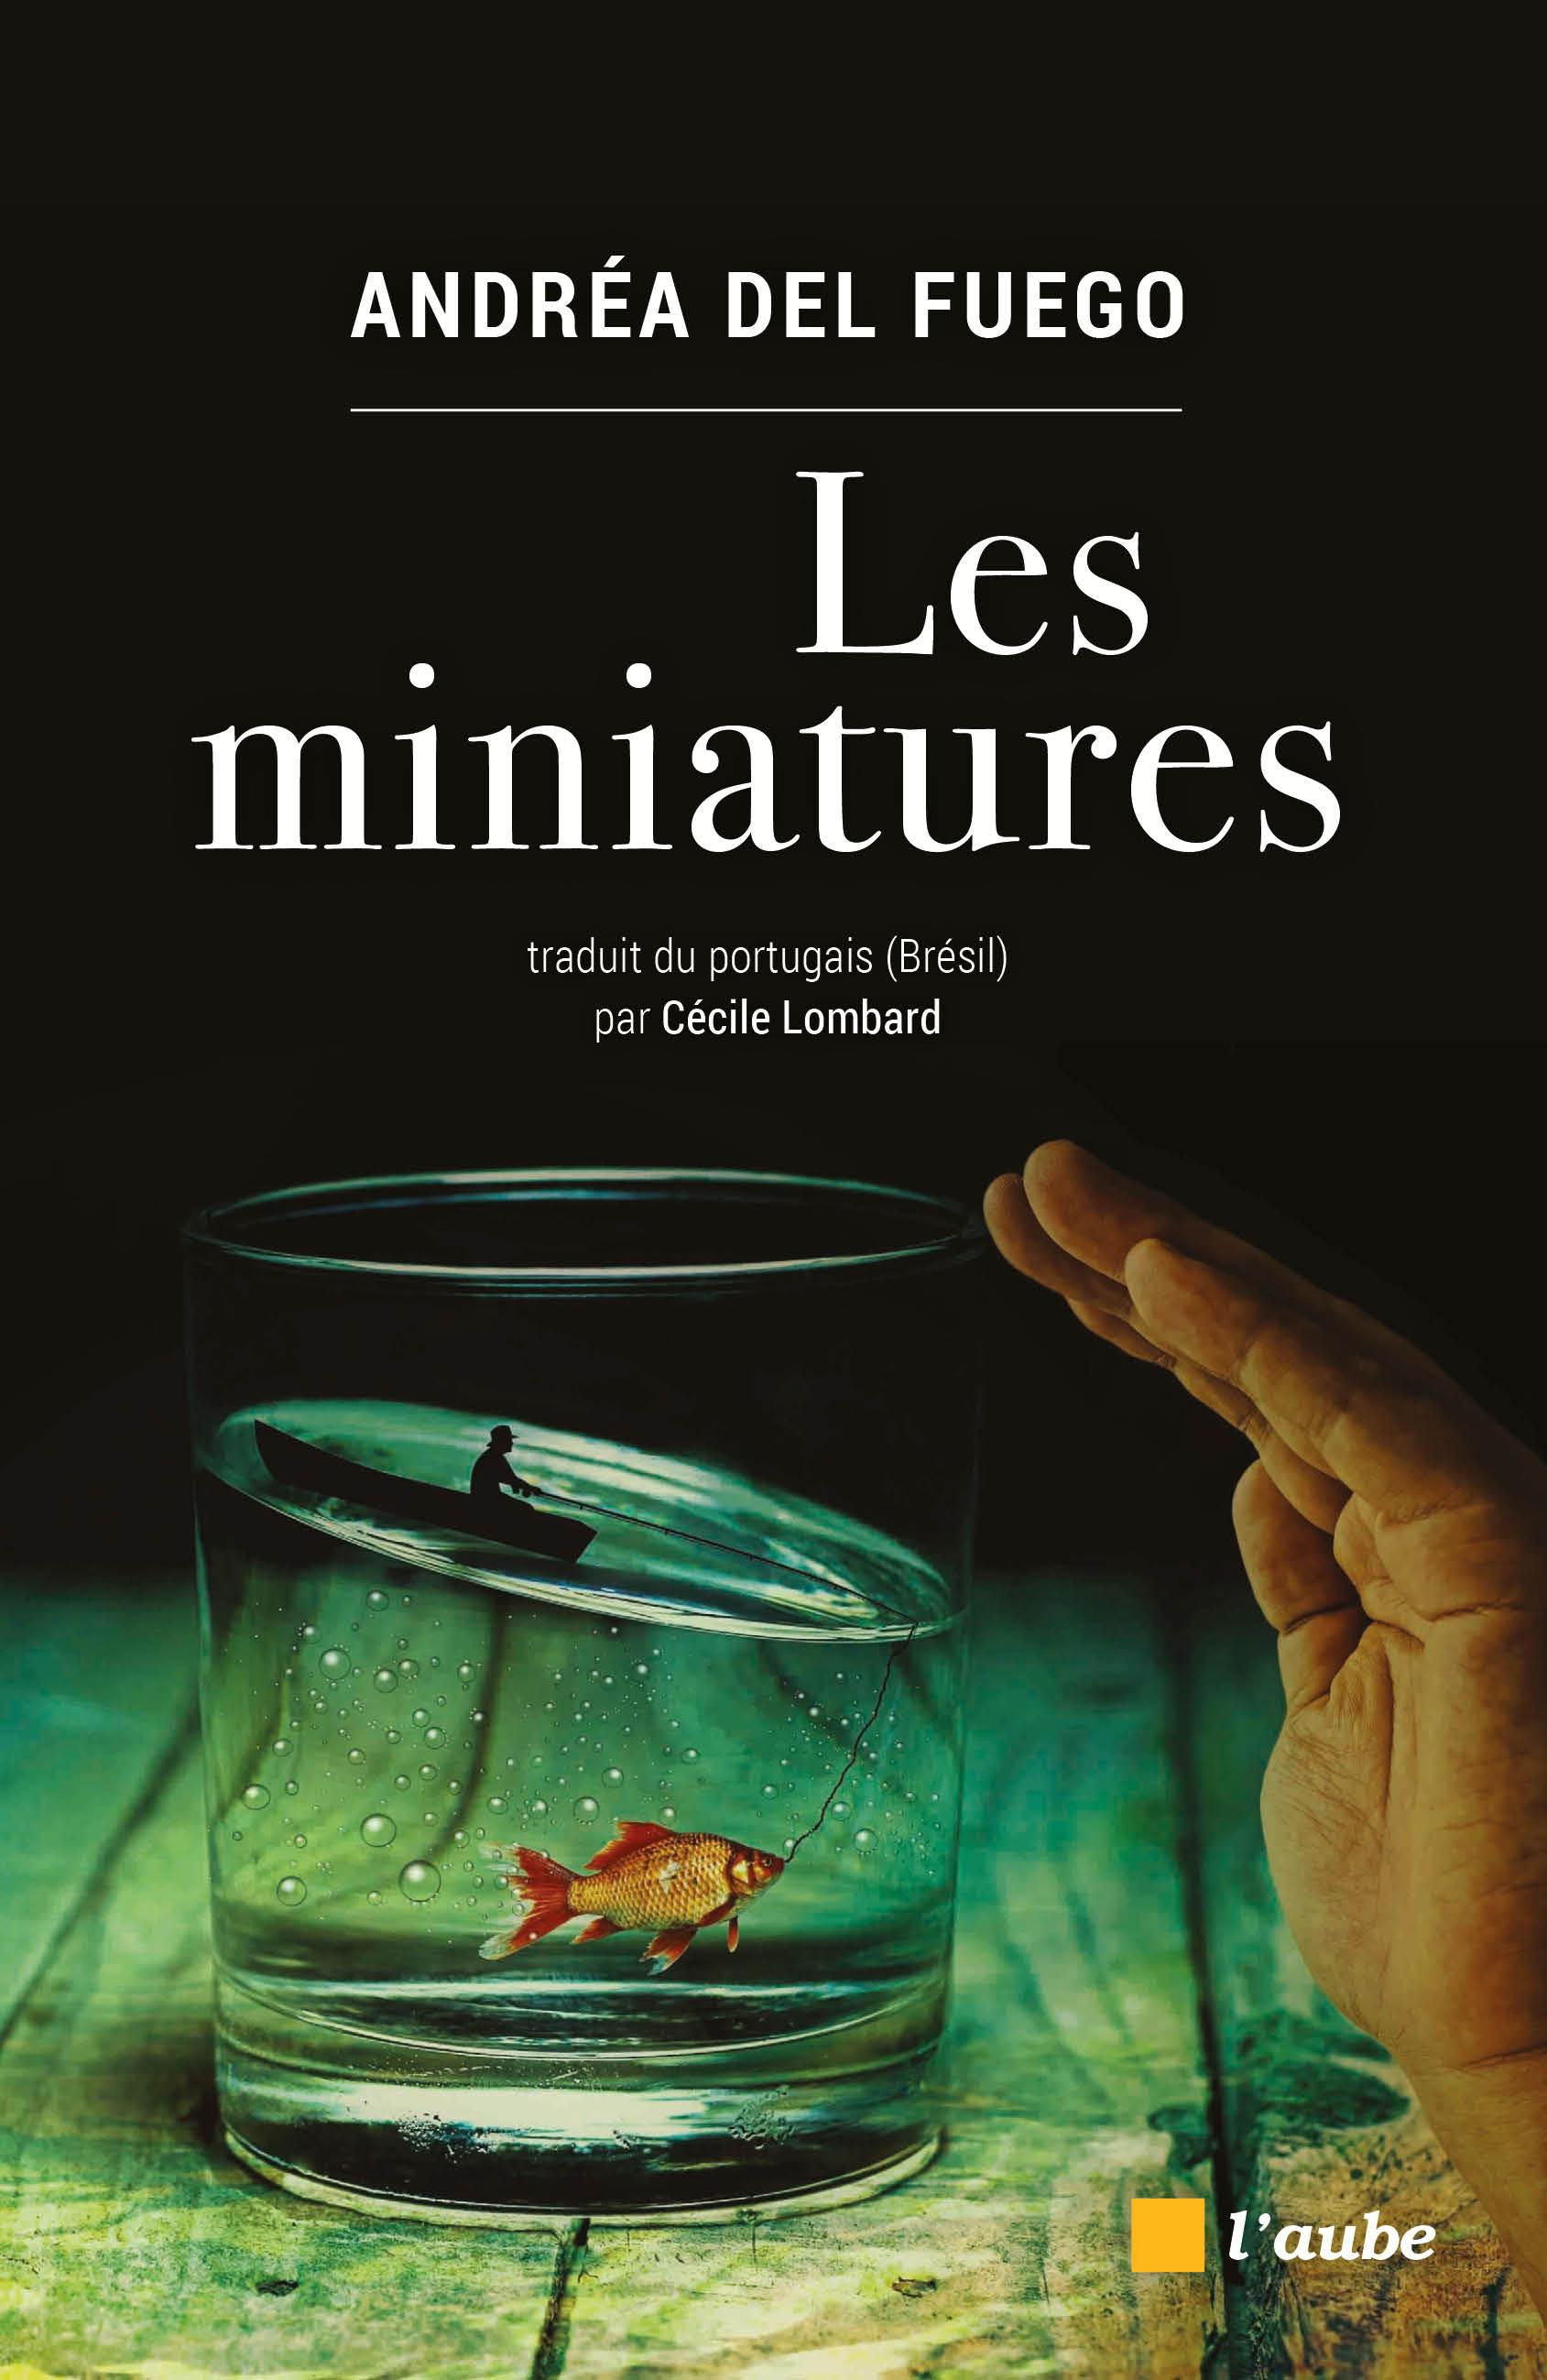 Les miniatures